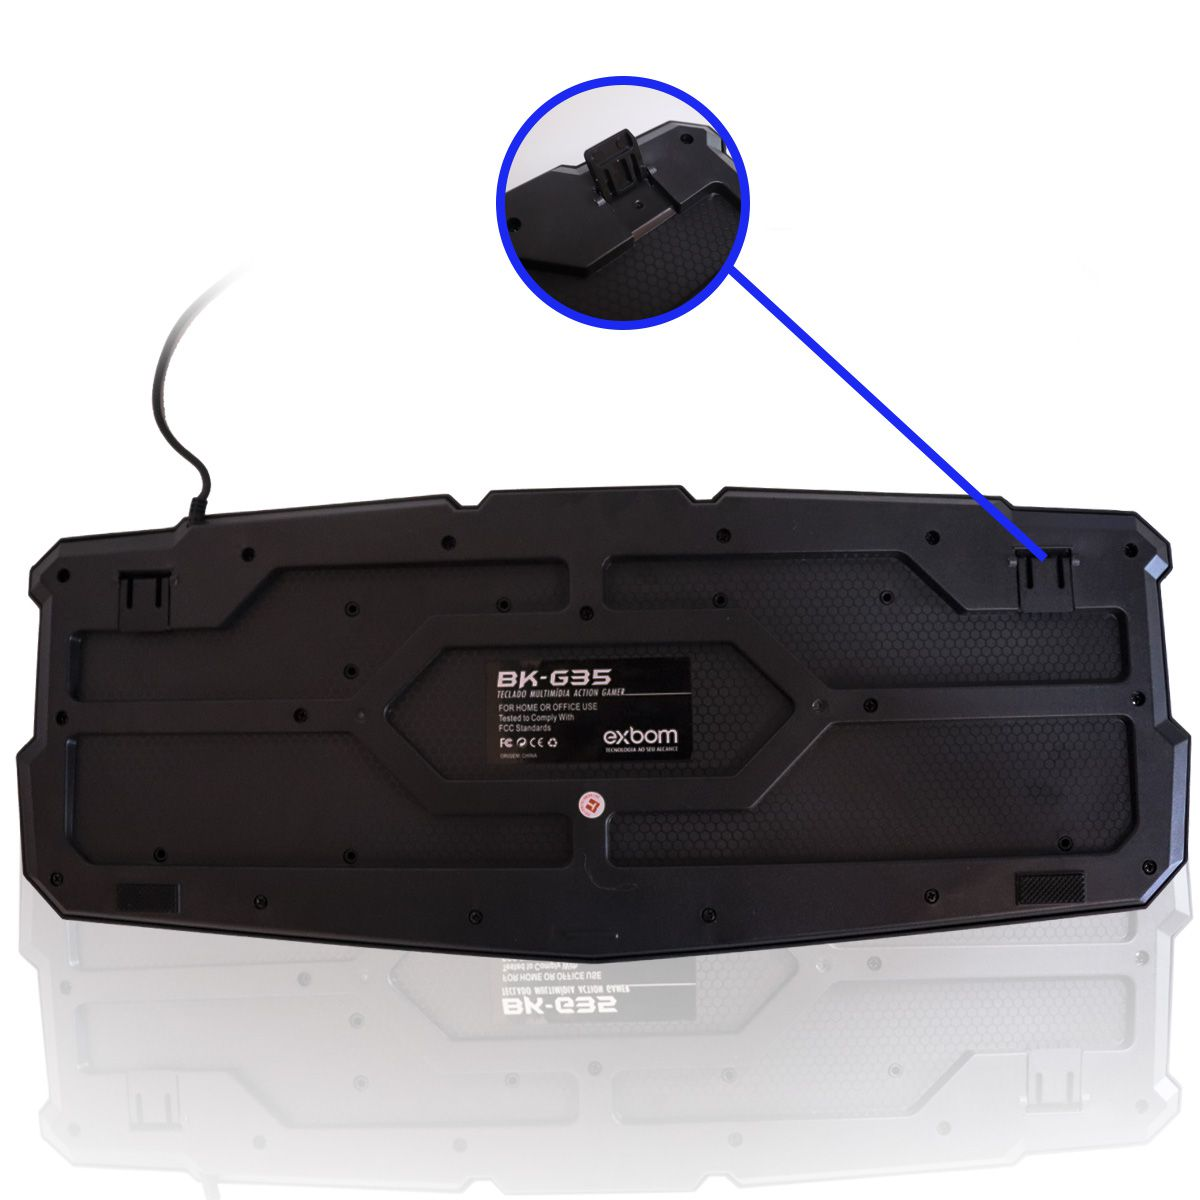 Teclado Gamer Multimídia USB Luminoso 3 Cores Exbom BK-G35